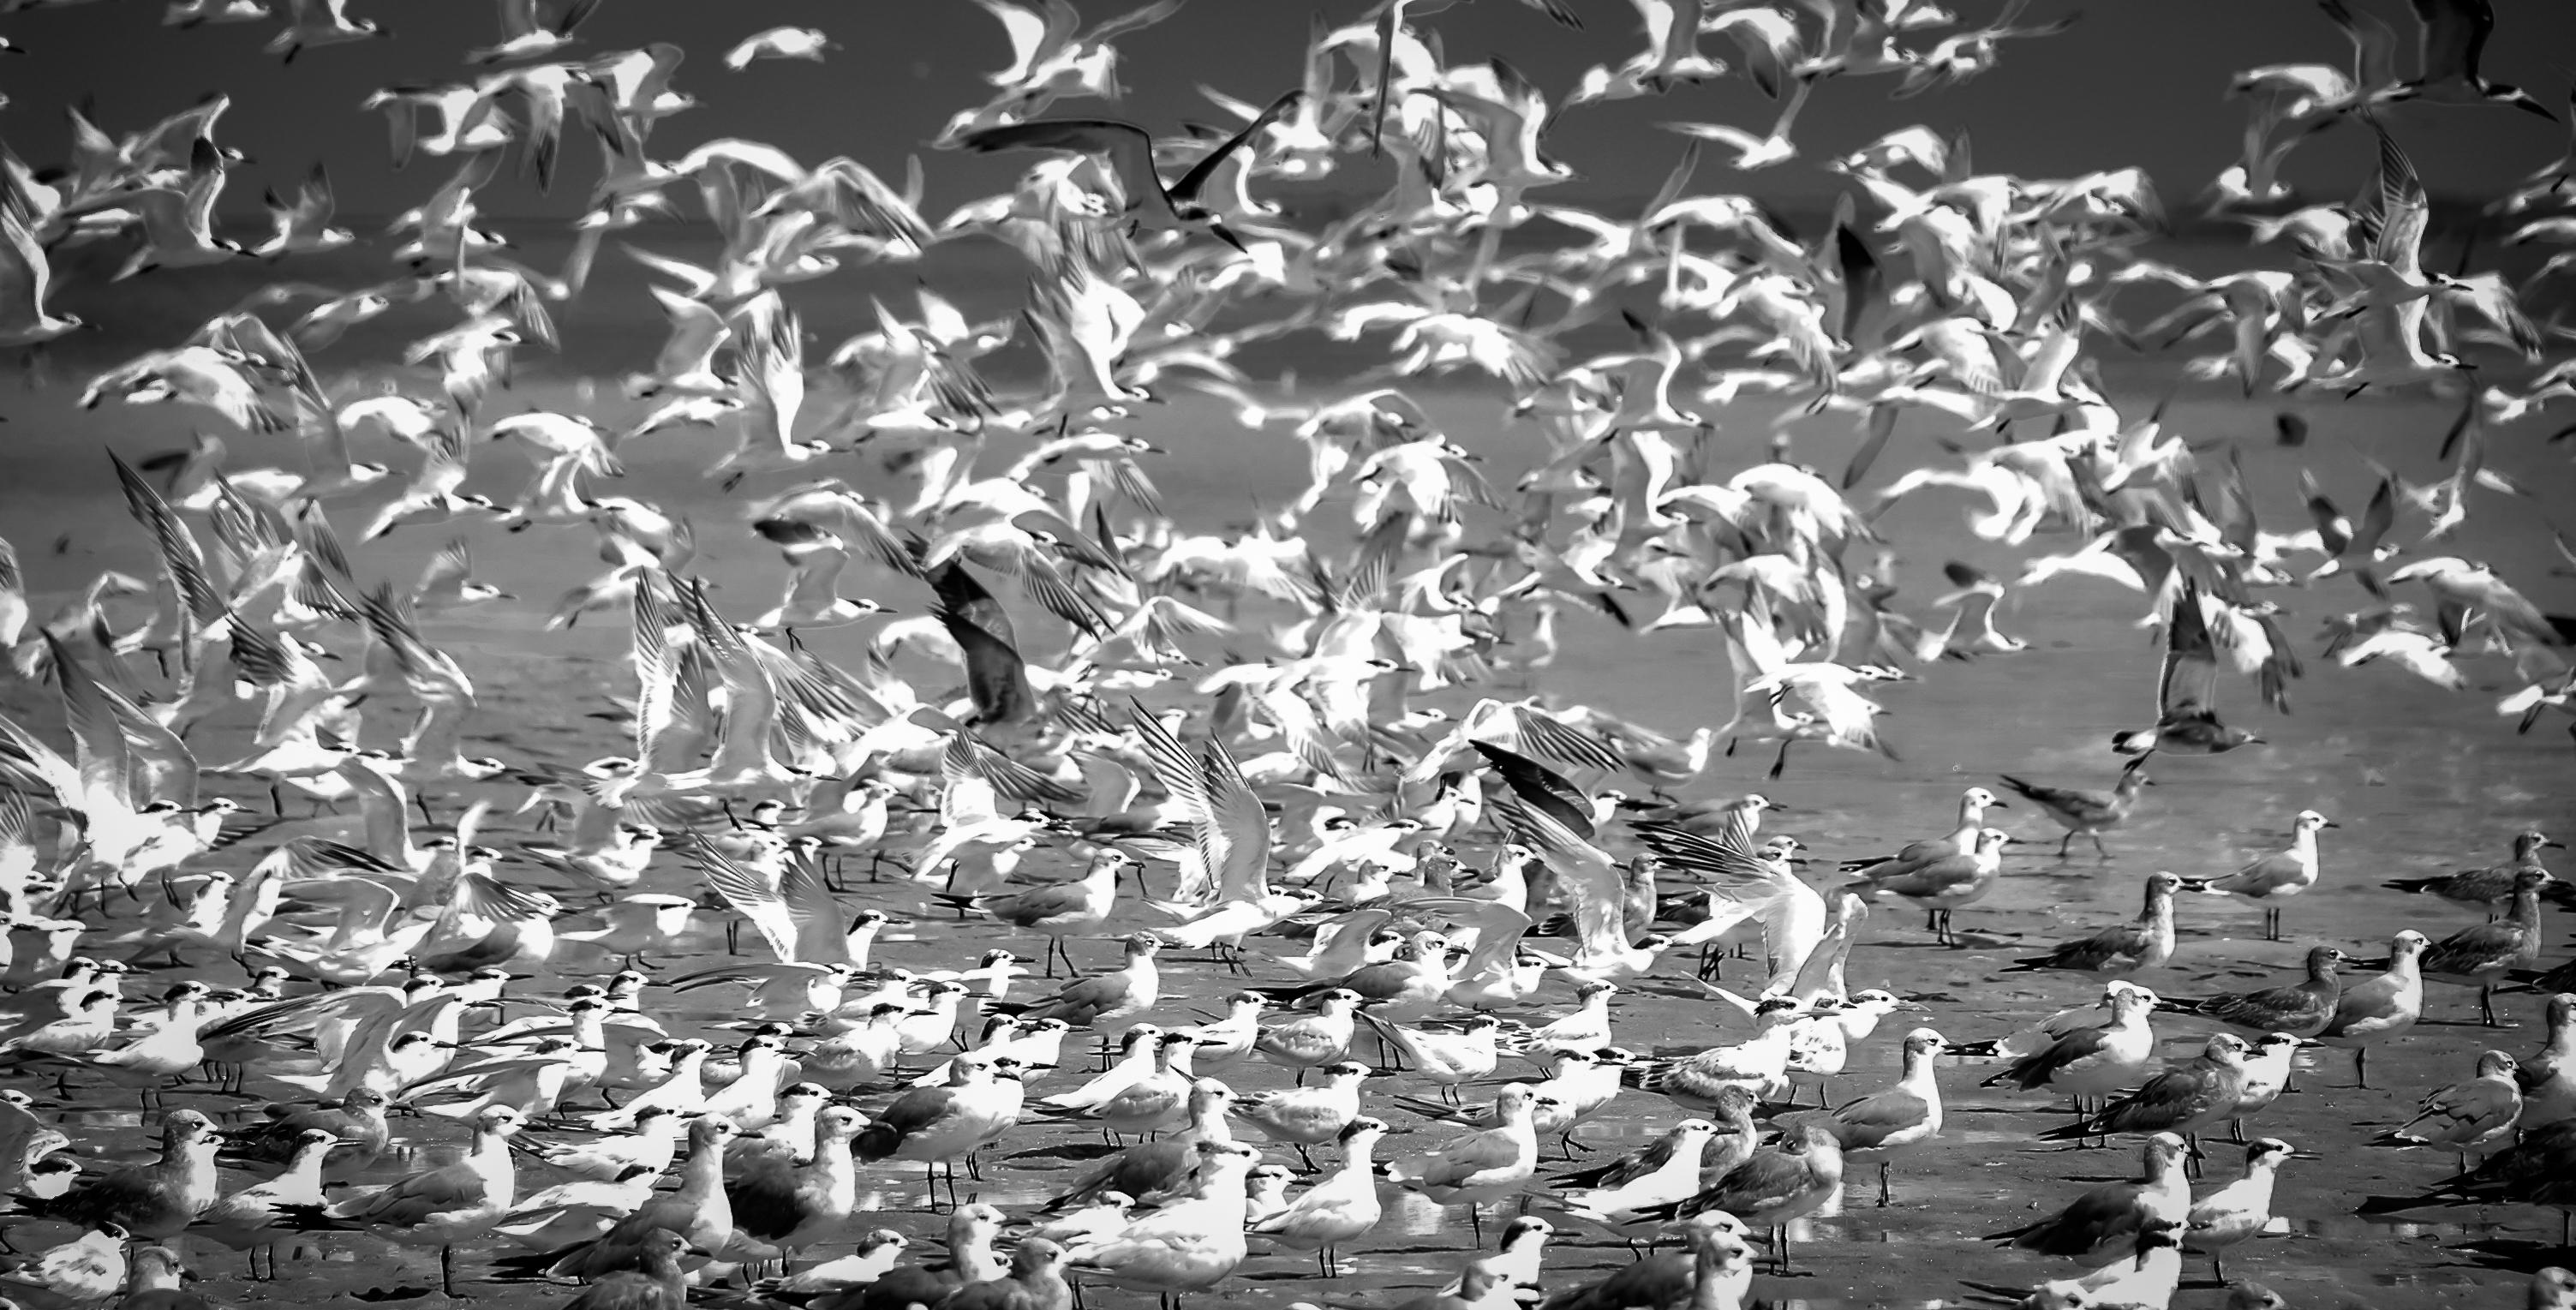 Seabirds Take Flight